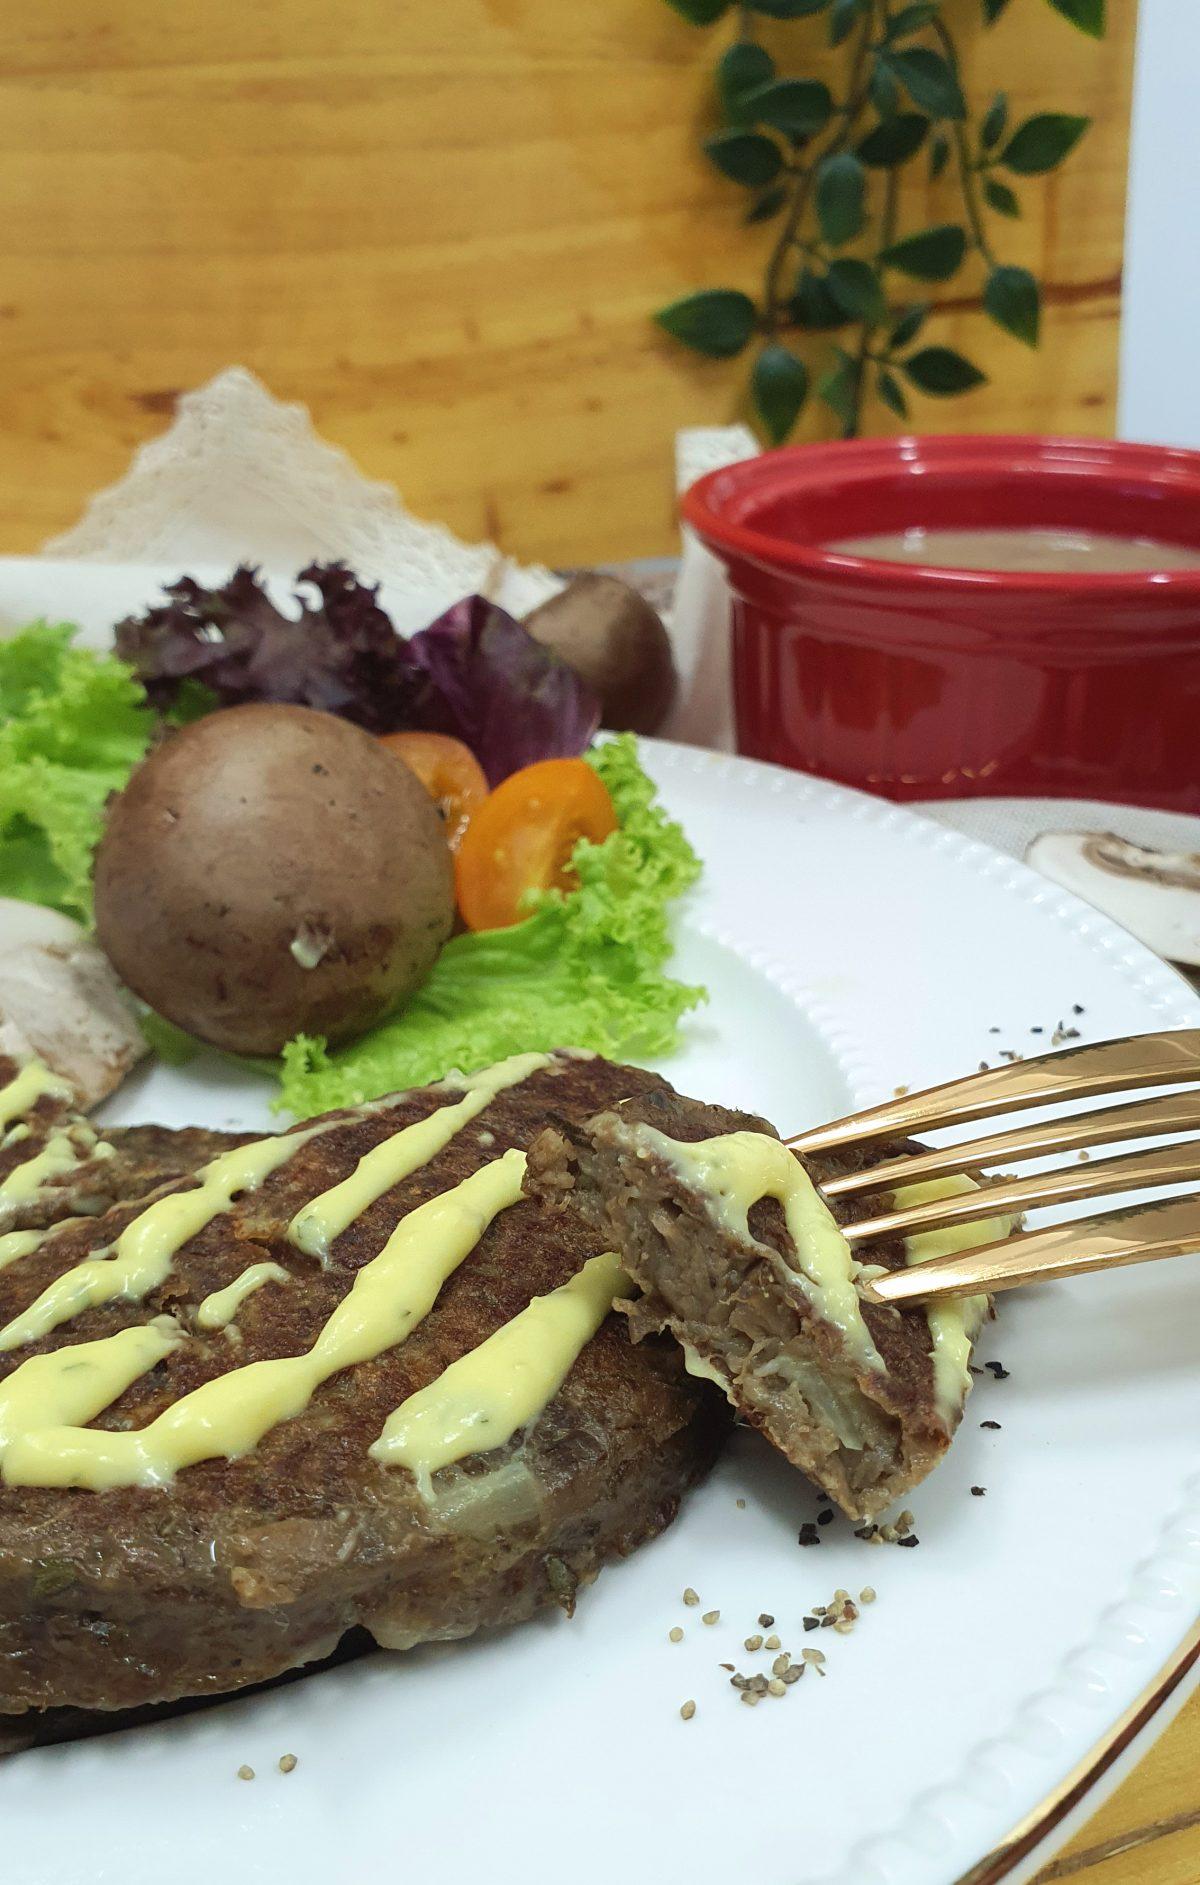 Korean-Mushroom-Patty-with-fresh-garlic-butter-spread